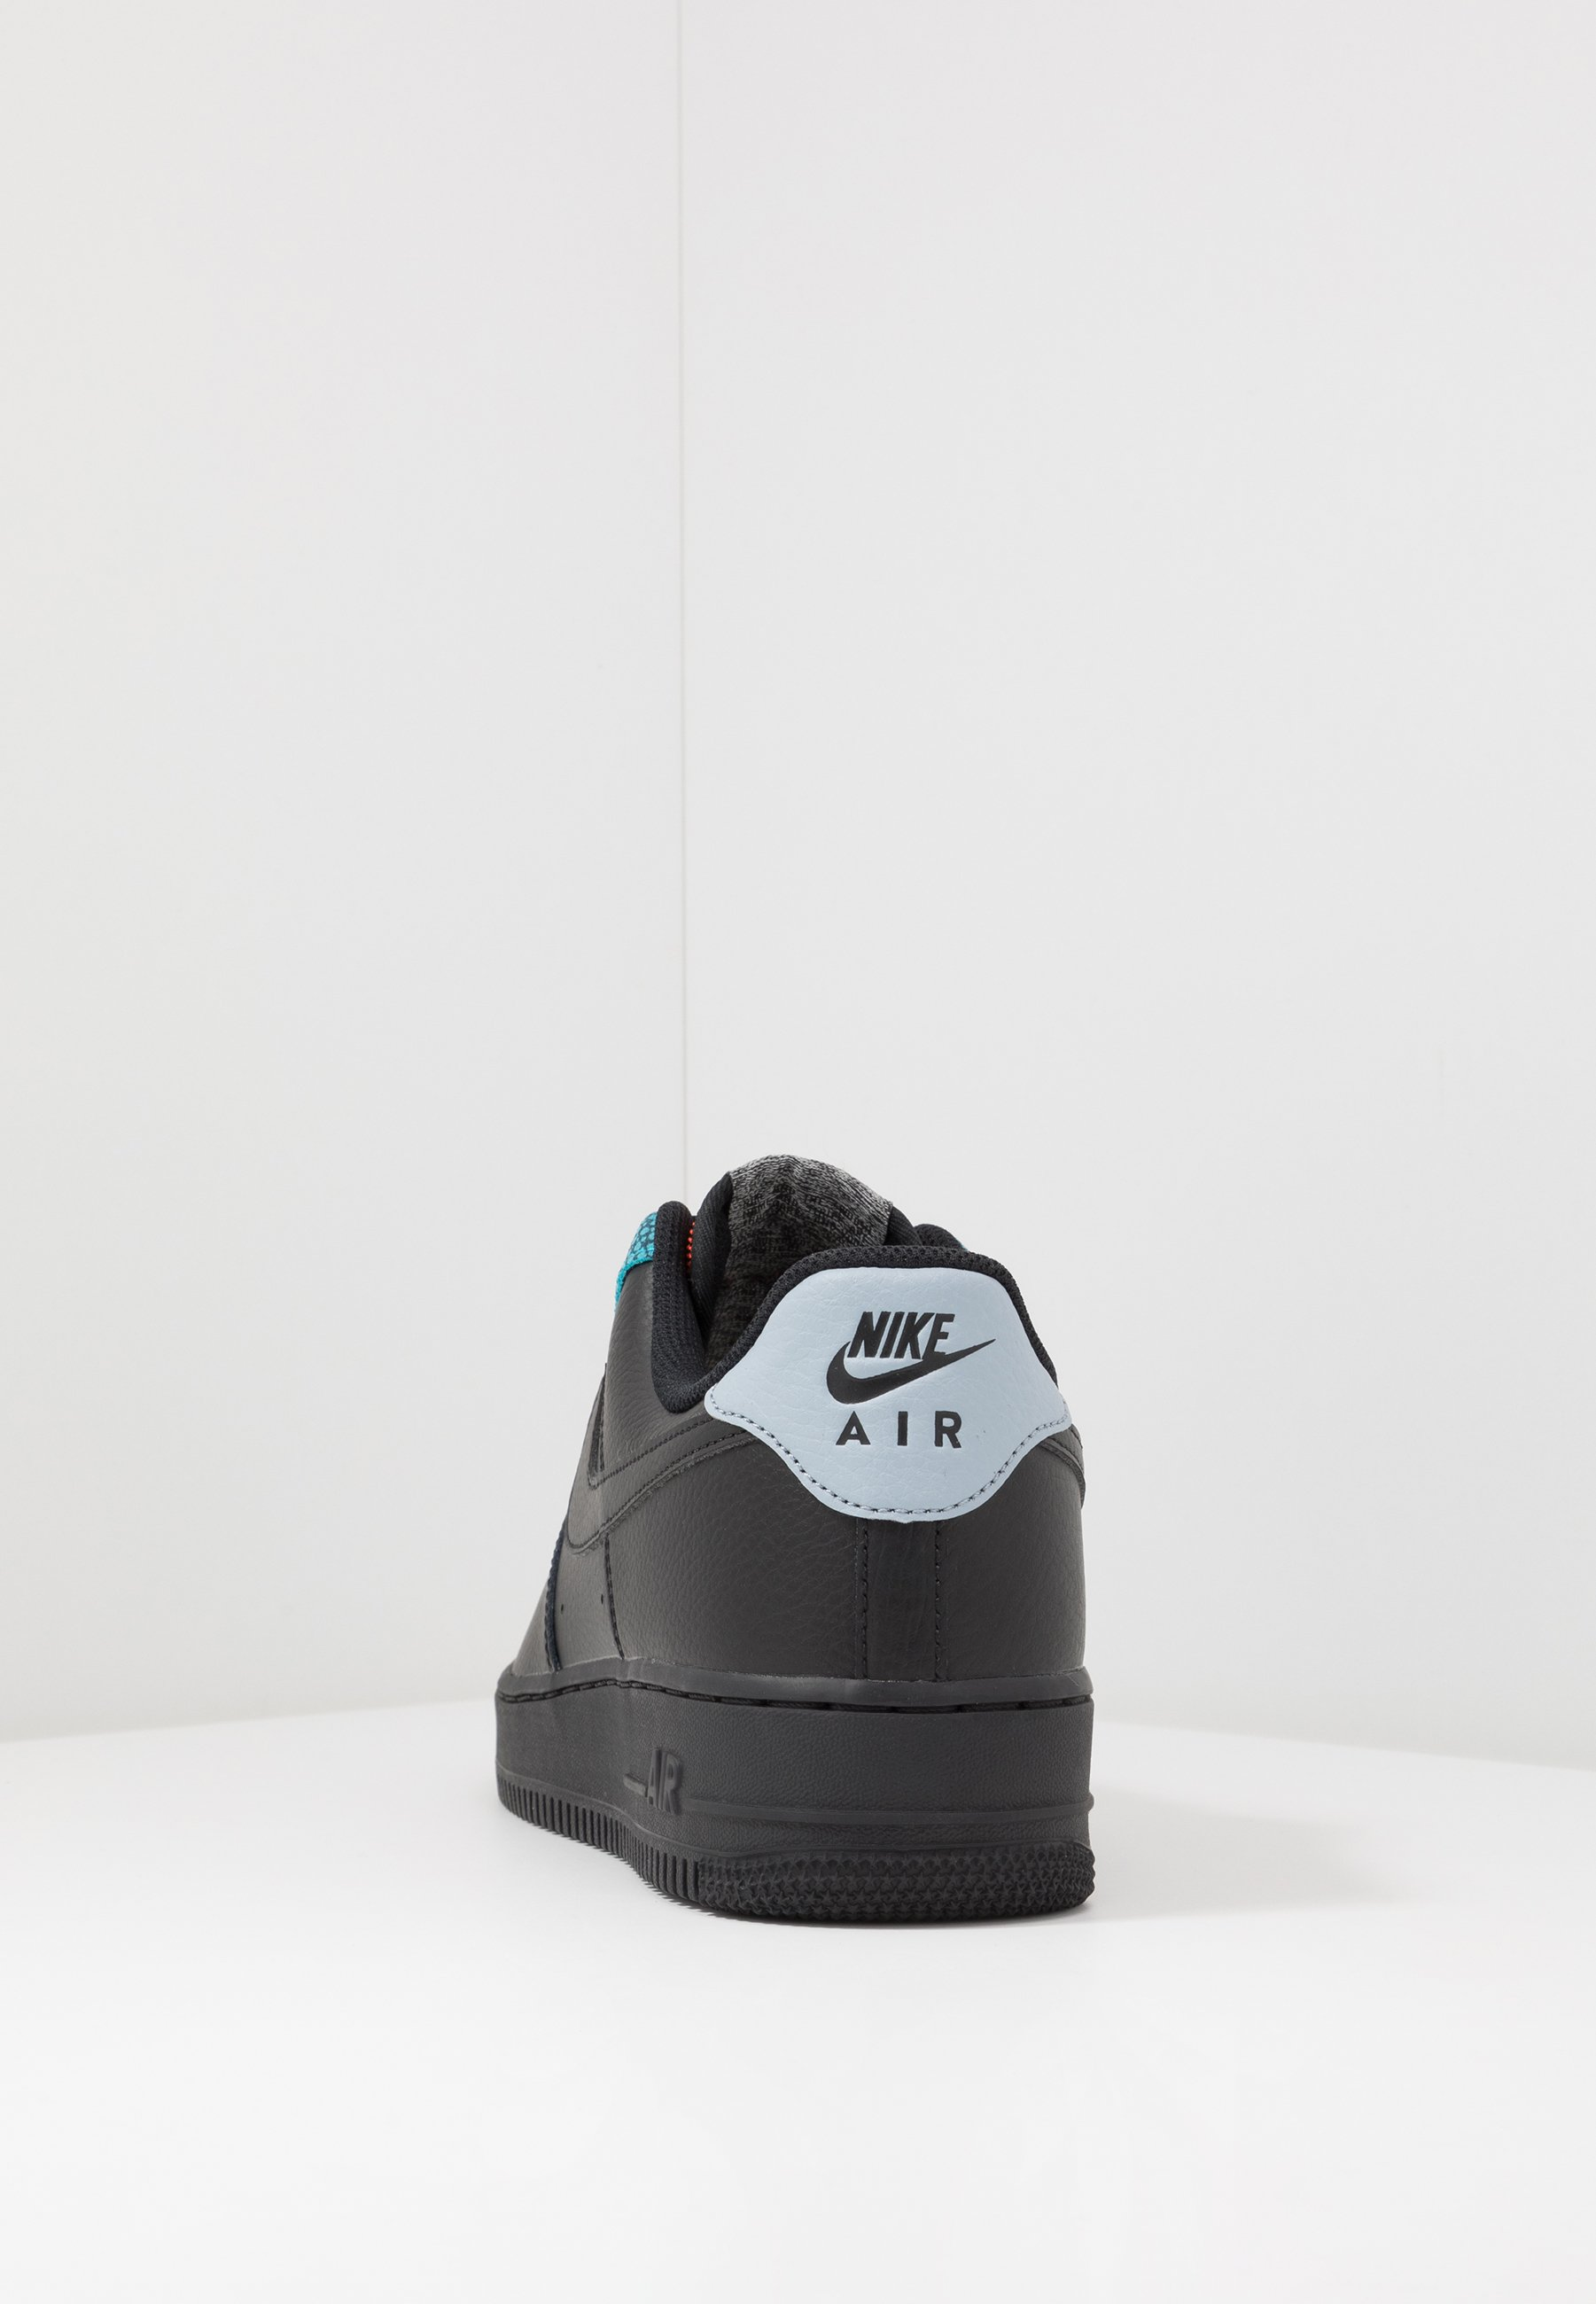 AIR FORCE 1 '07 LV8 Sneakersy niskie blackobsidian mistcool greyblue furybright crimson